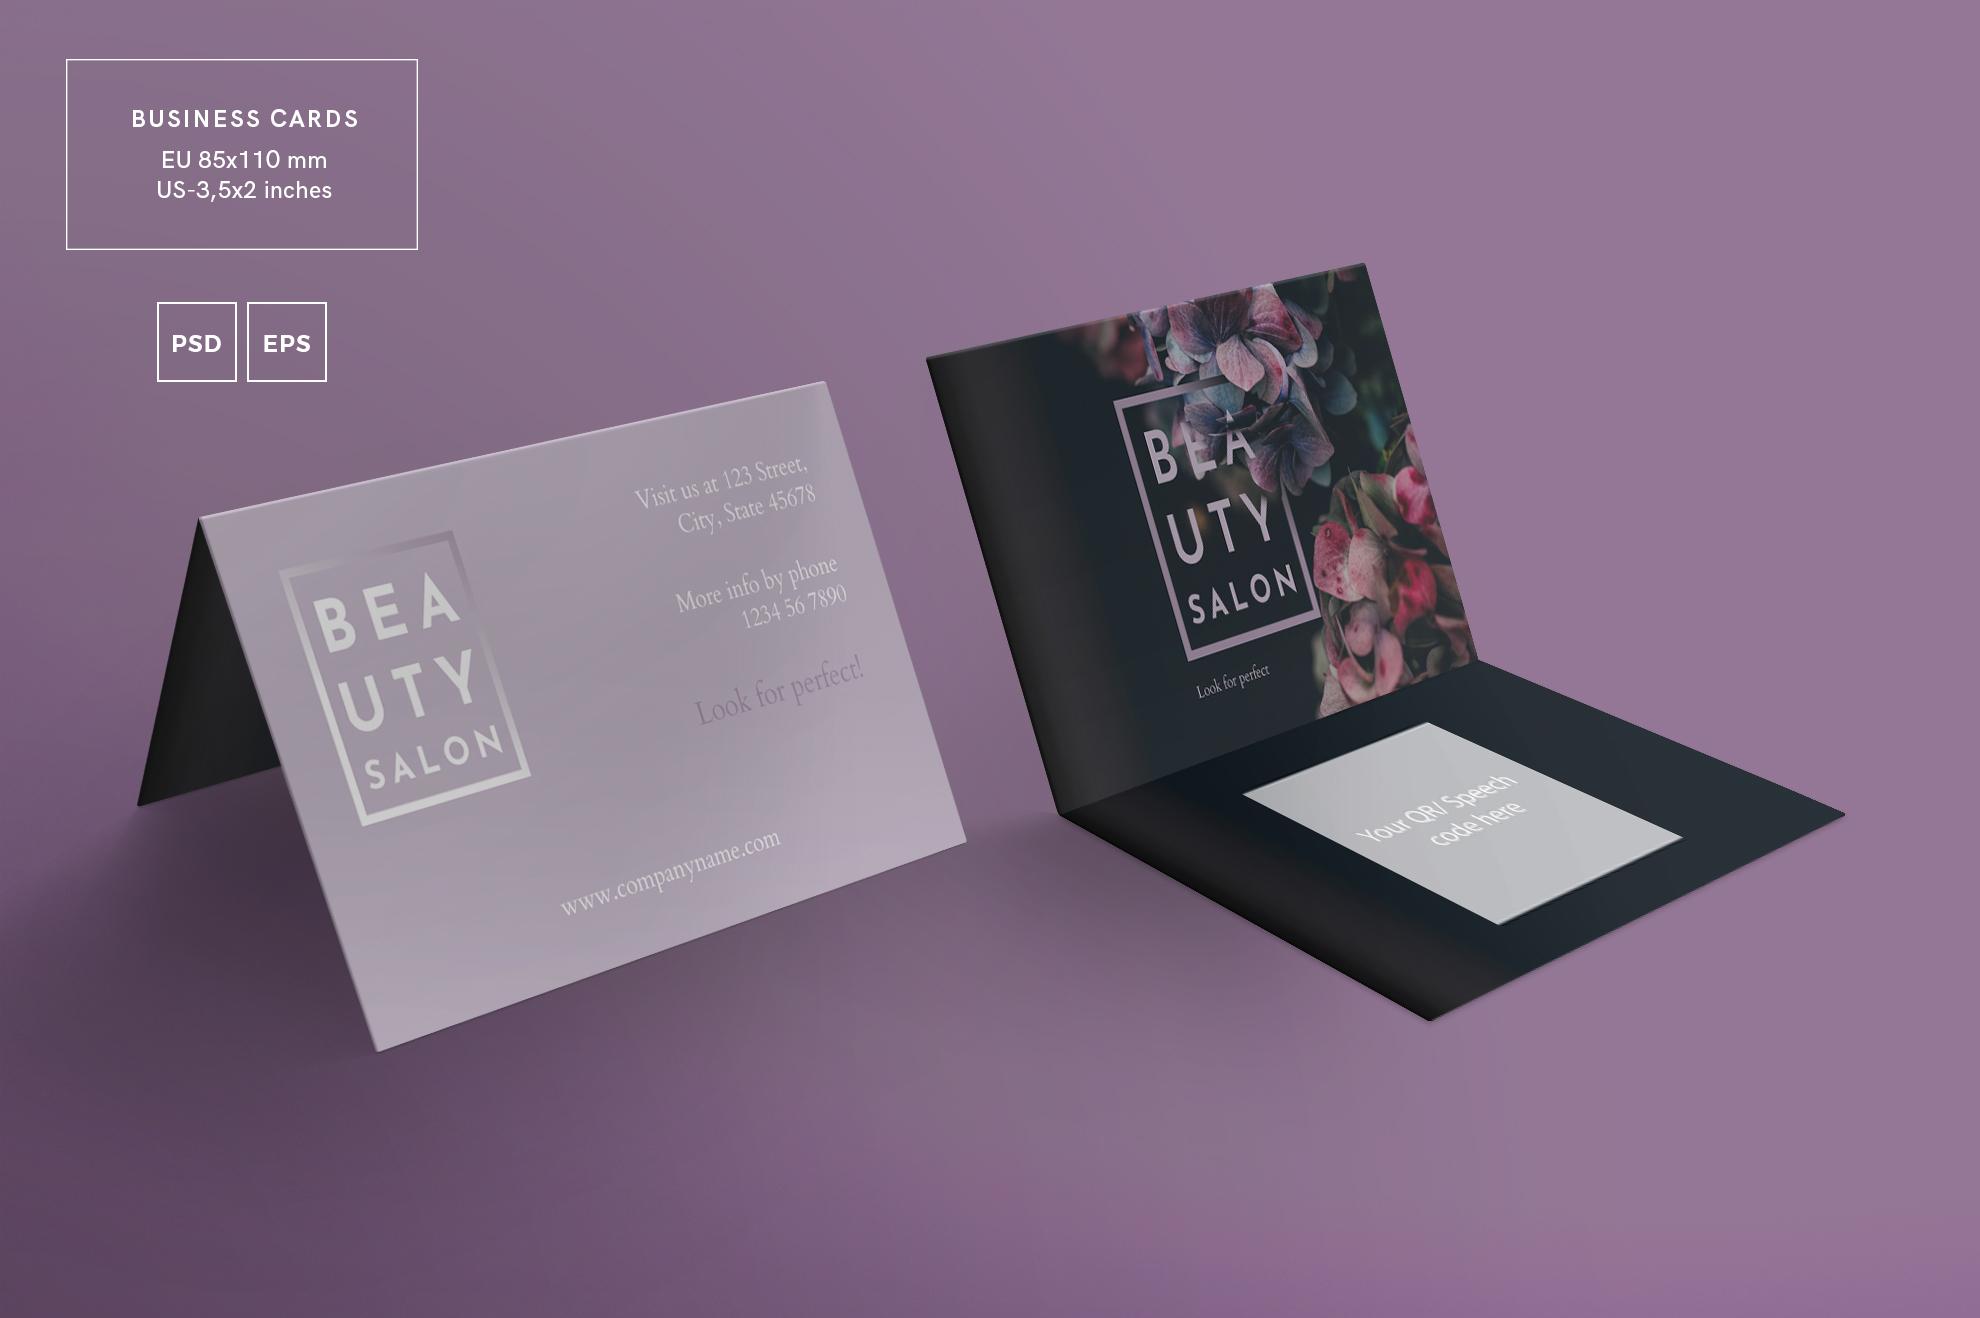 Beauty Salon Business Card Design Templates Kit example image 3